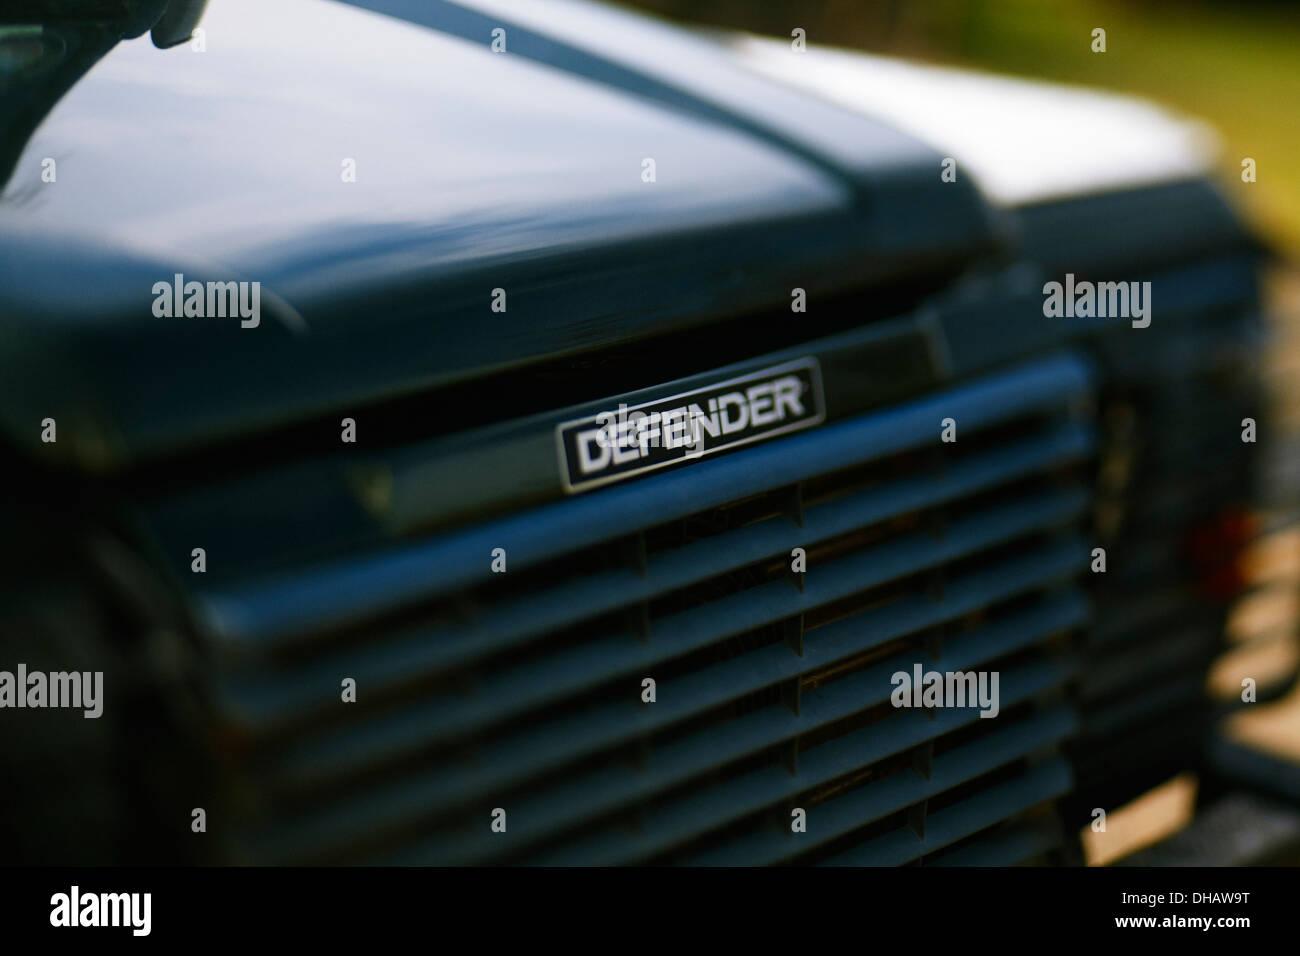 Land Rover Defender badge - Stock Image